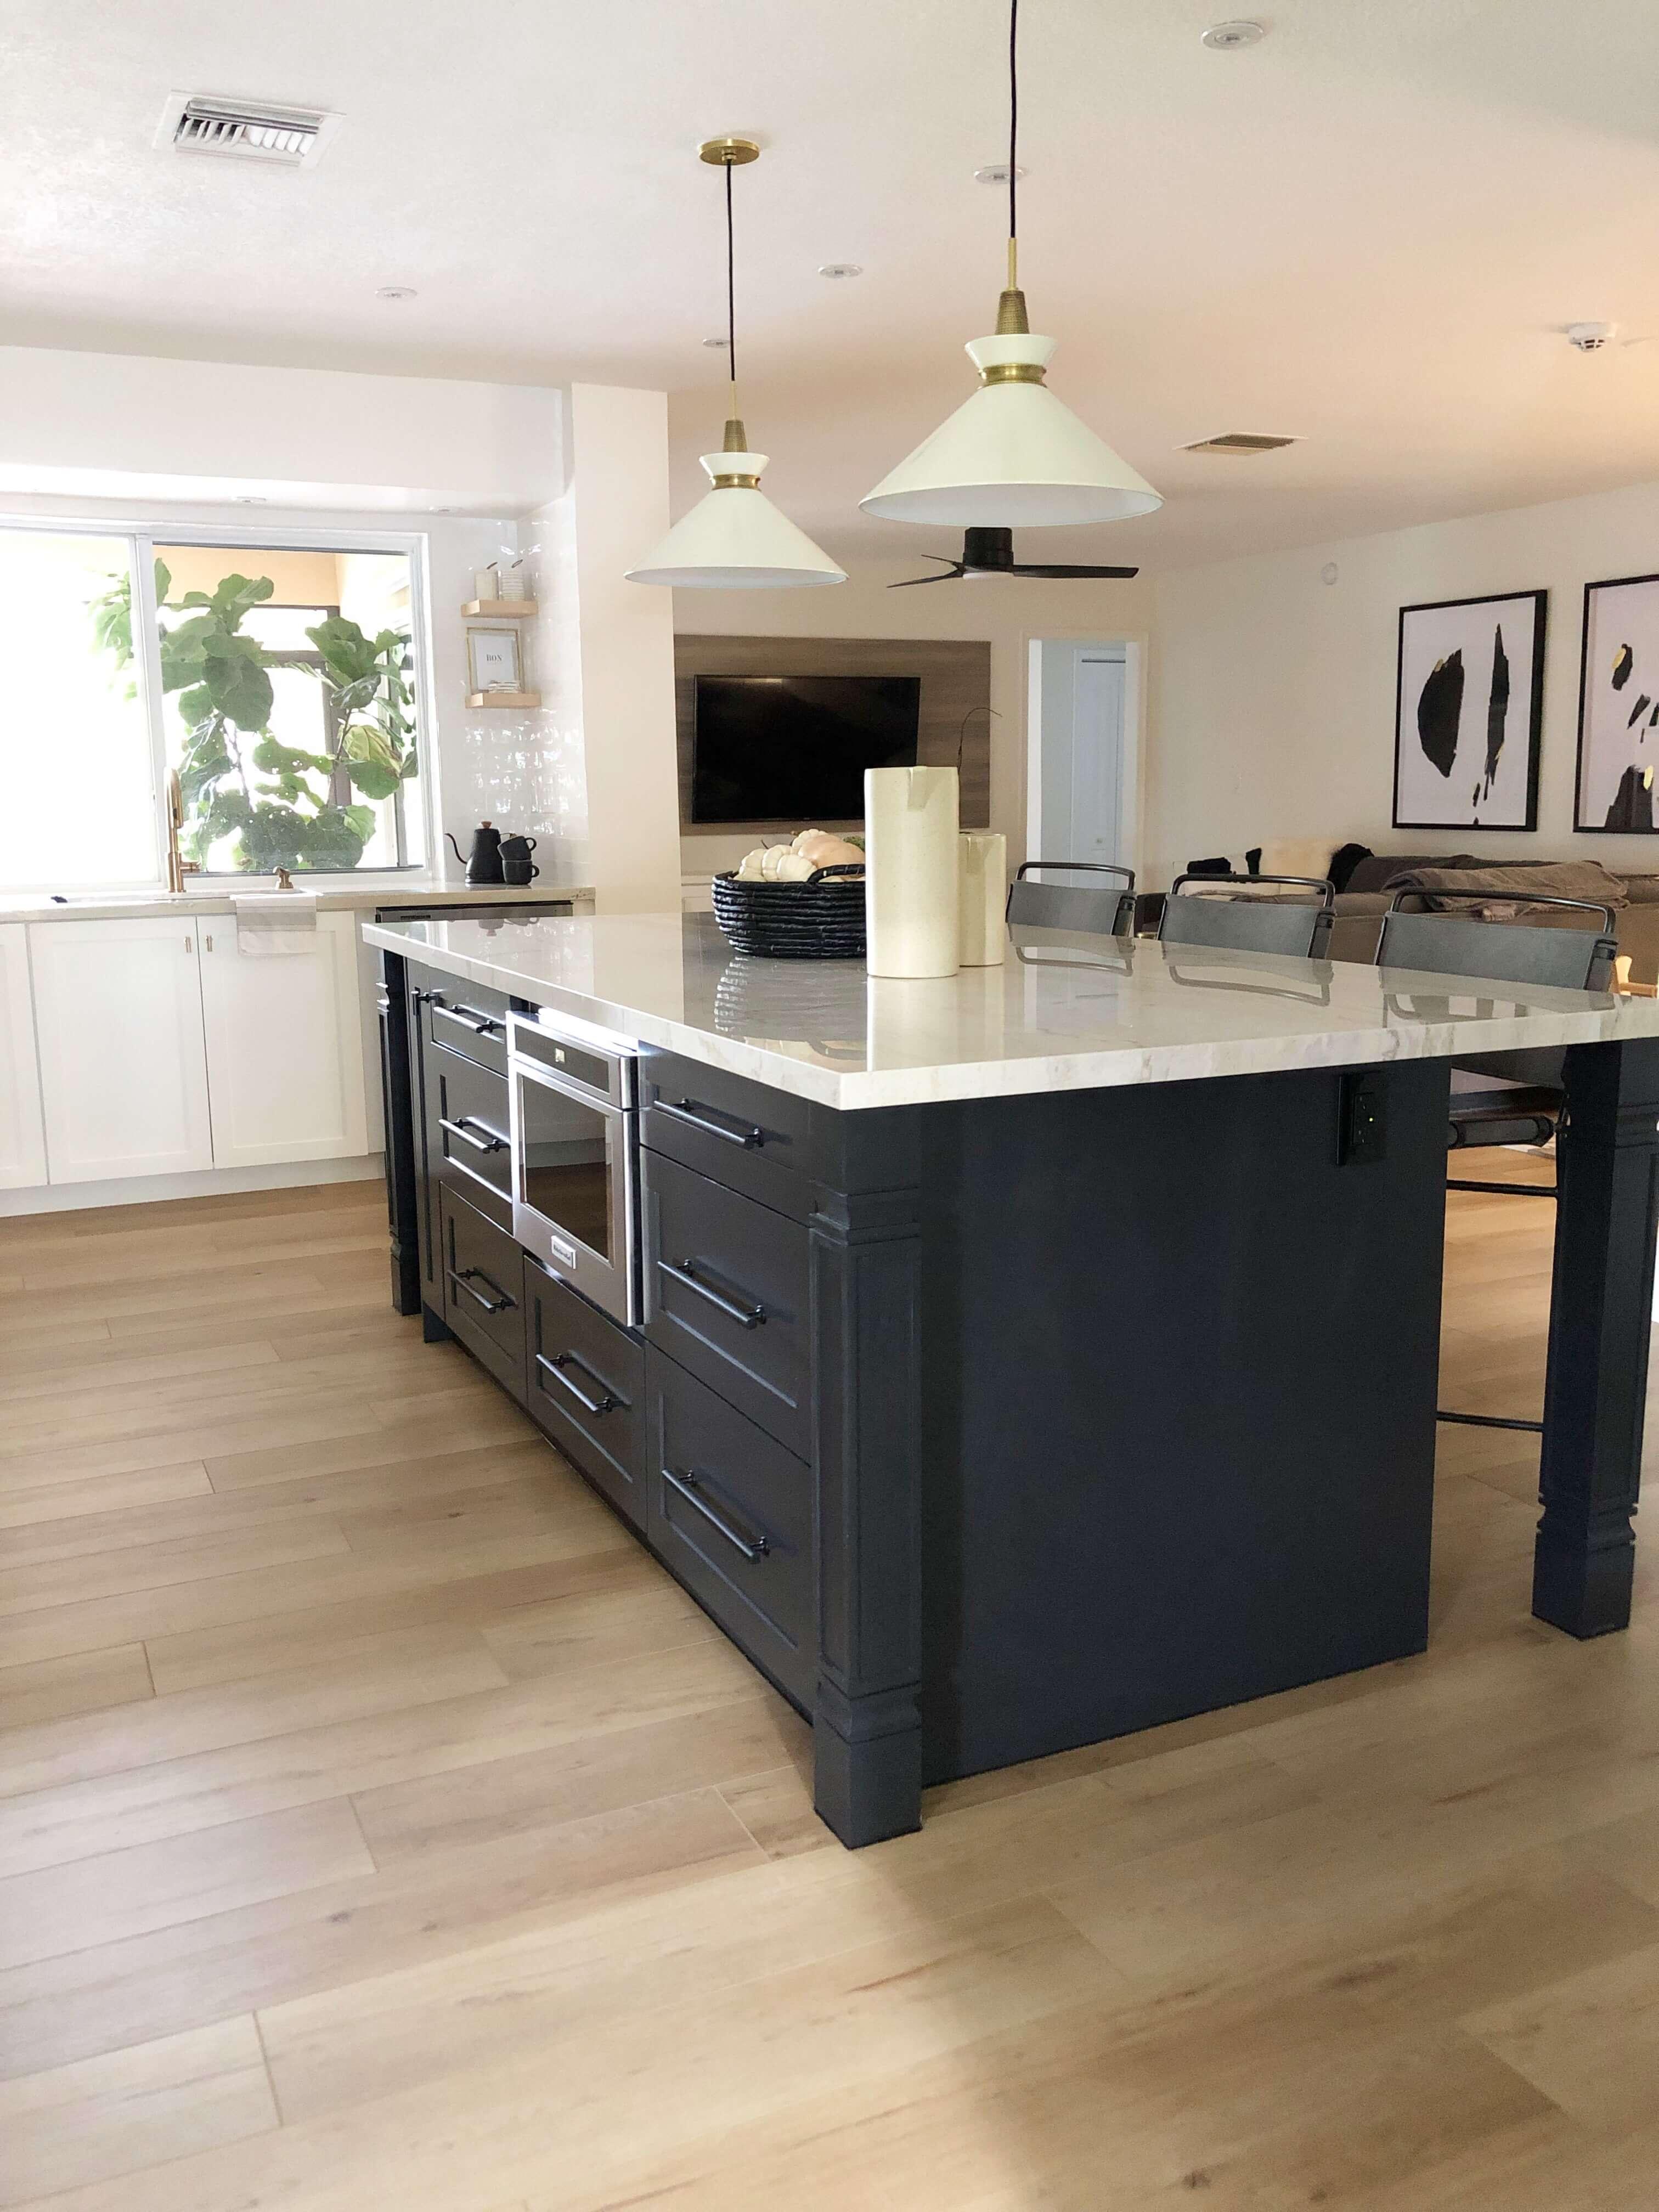 South Florida Kitchen Remodel